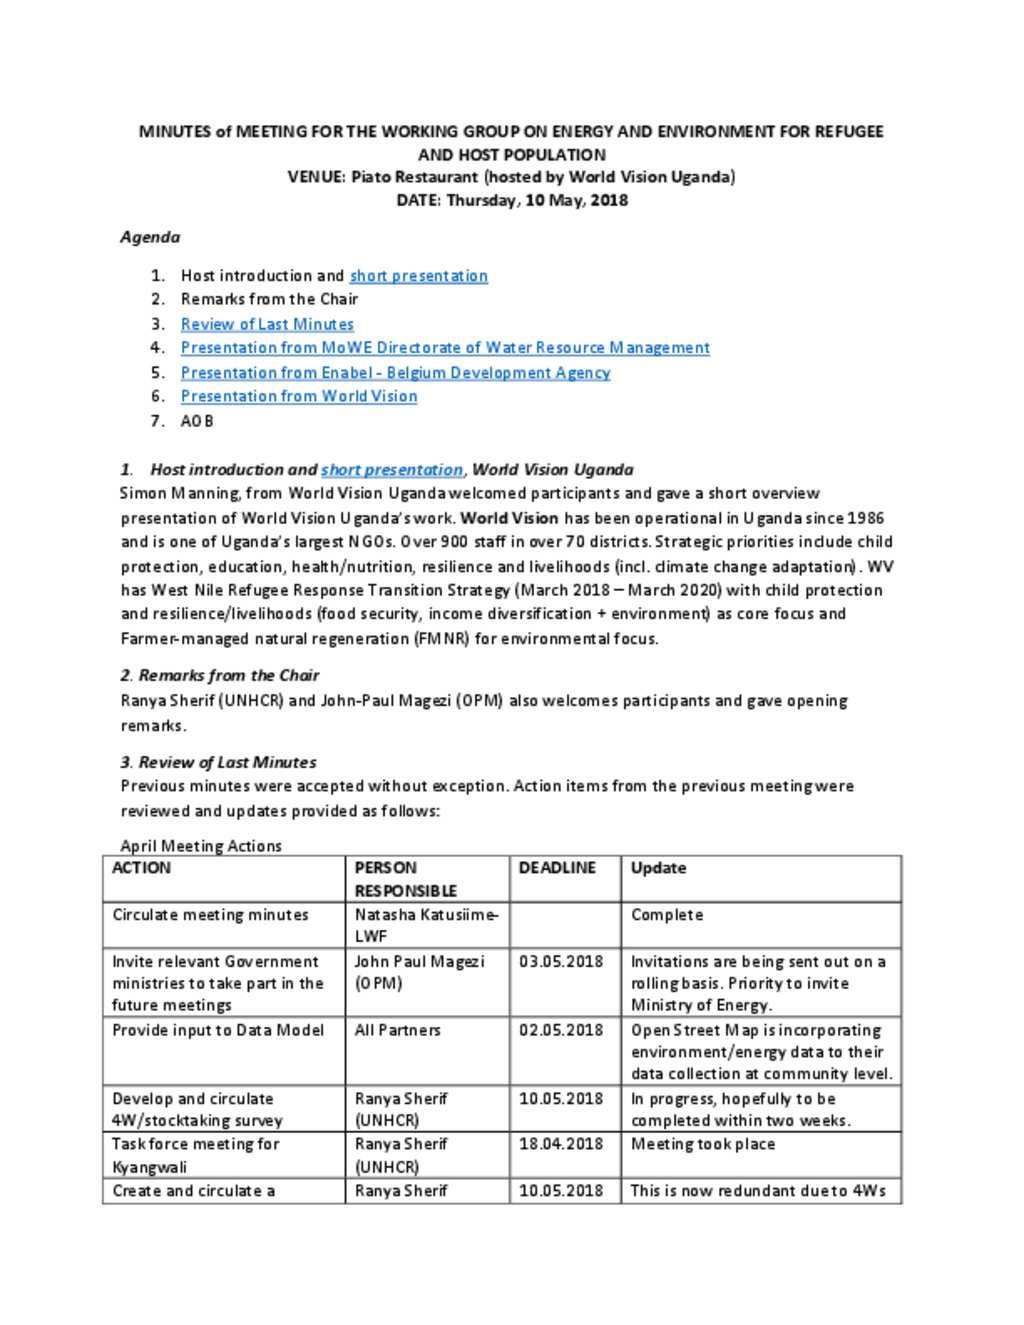 Document - 20180510 MoM - WorkGrEEn for ReHoPE